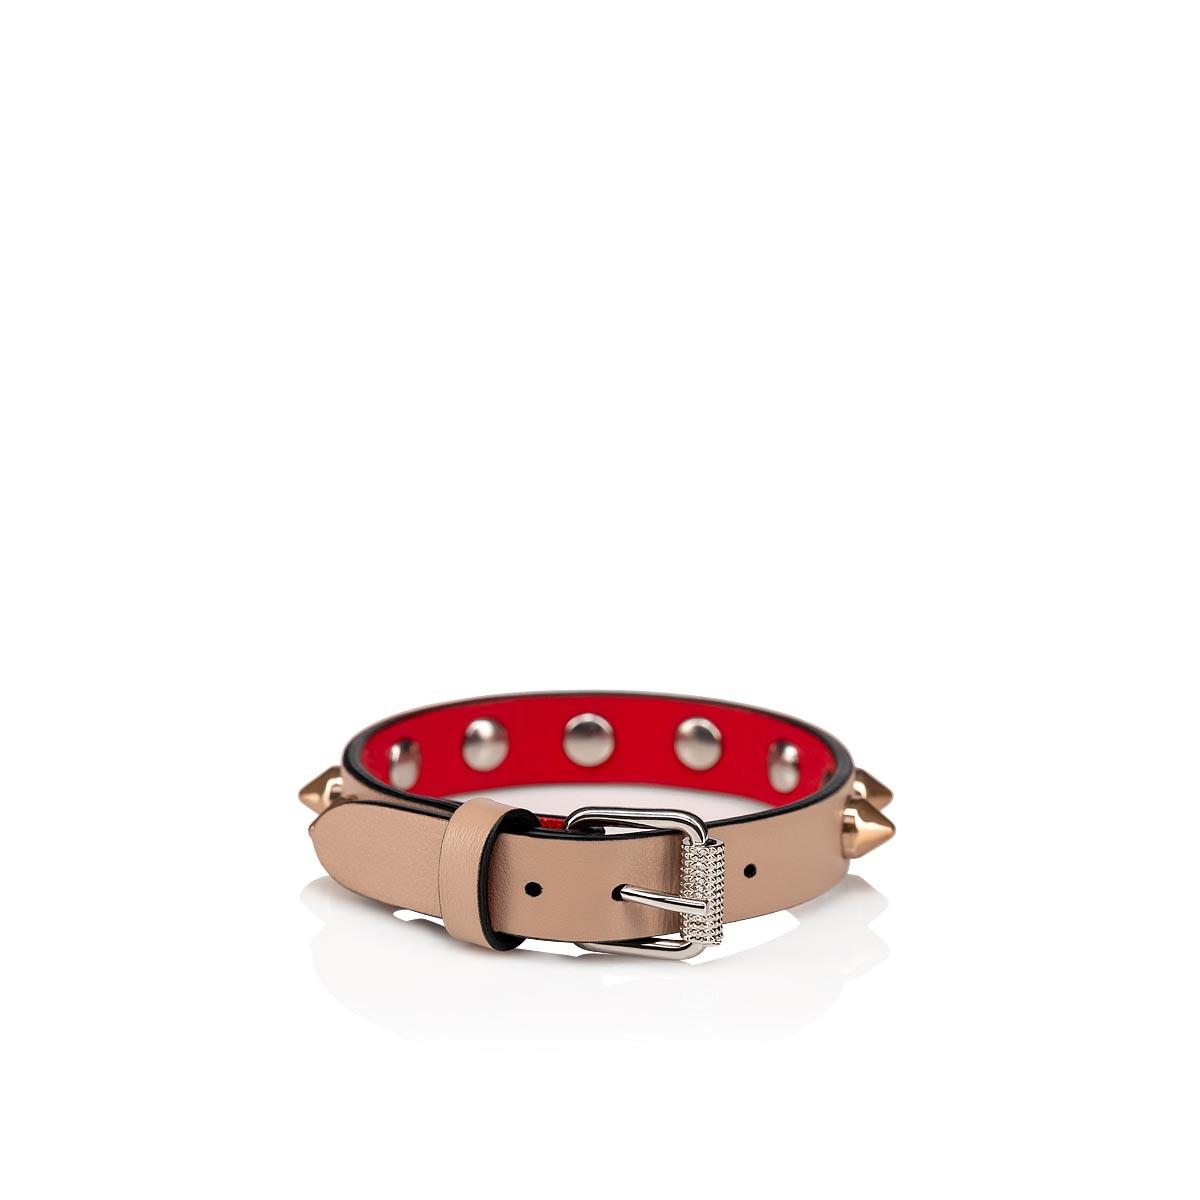 Small Leather Goods - Loubilink Bracelet - Christian Louboutin